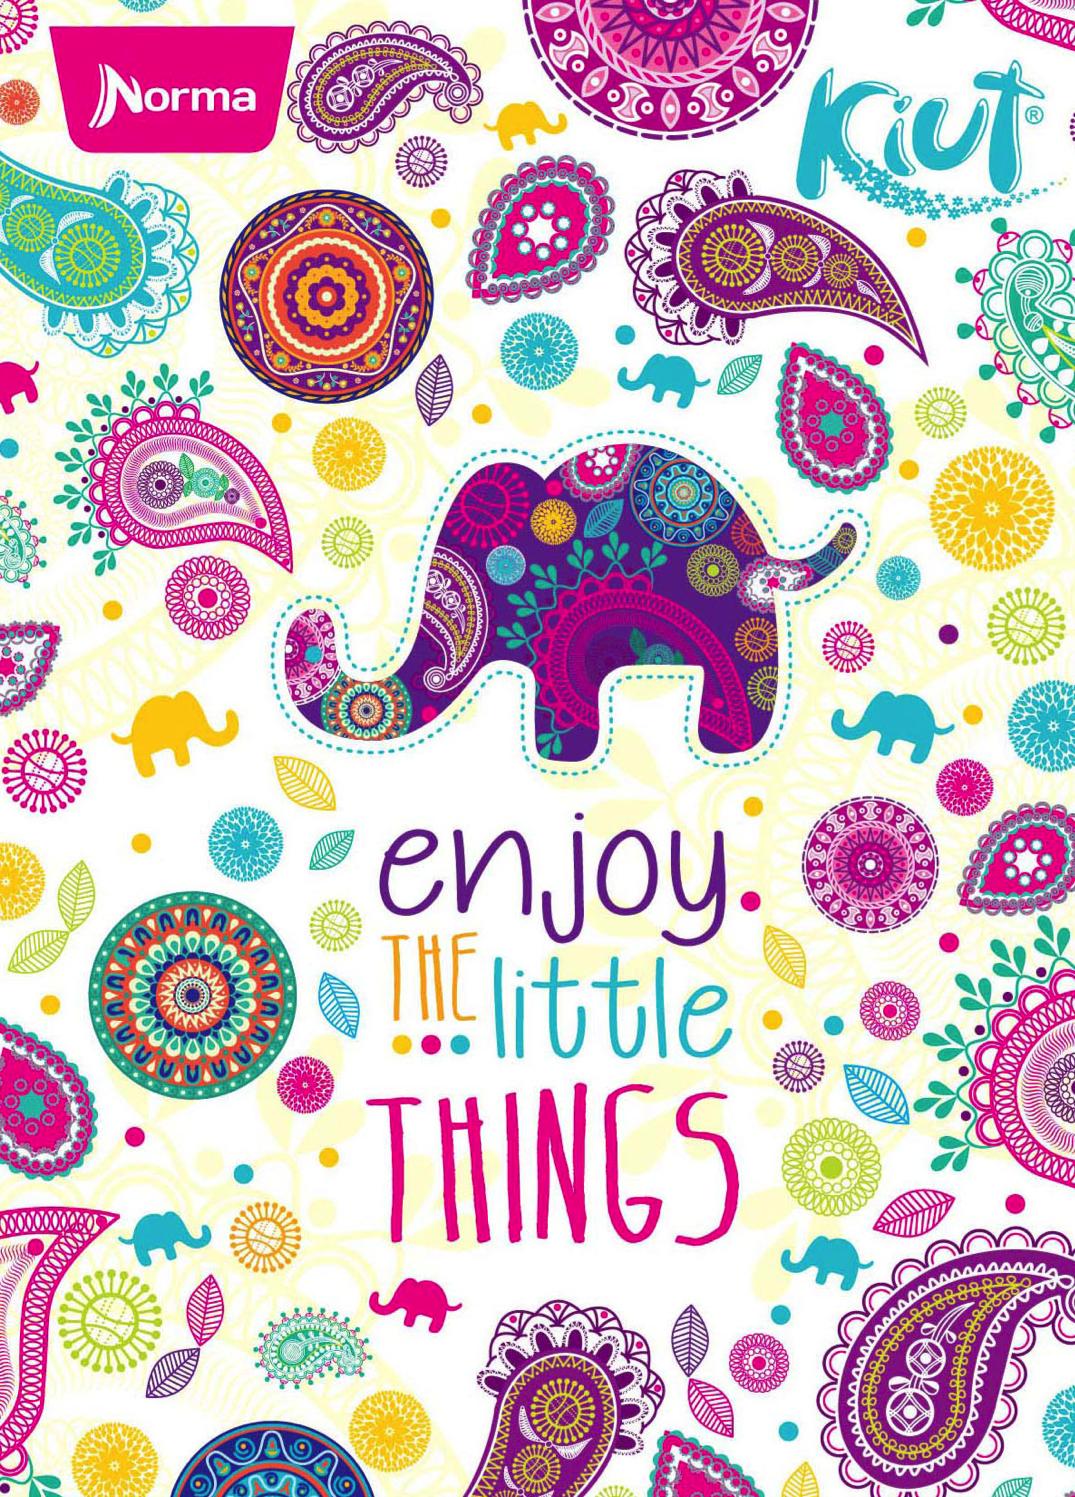 Inspiration | para imprimir | Pinterest | Fondos, Hoja y Pantalla